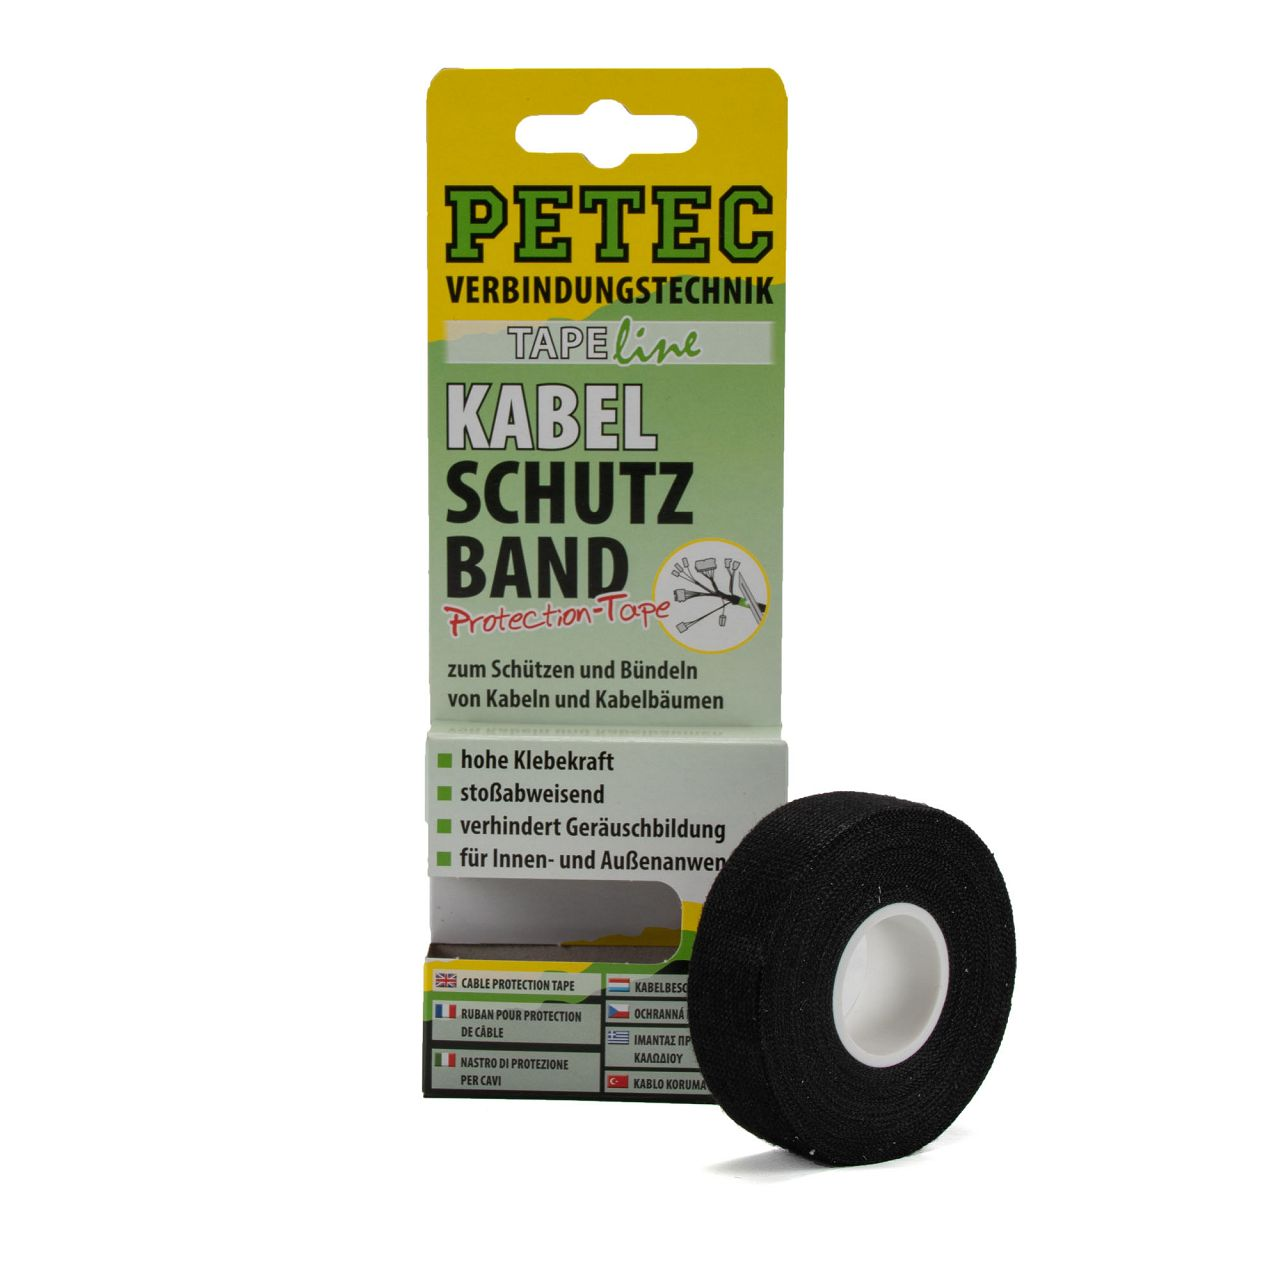 PETEC 87500 Kabelschutzband Klebeband schwarz 0,3mm Dicke 19mm x 10 m